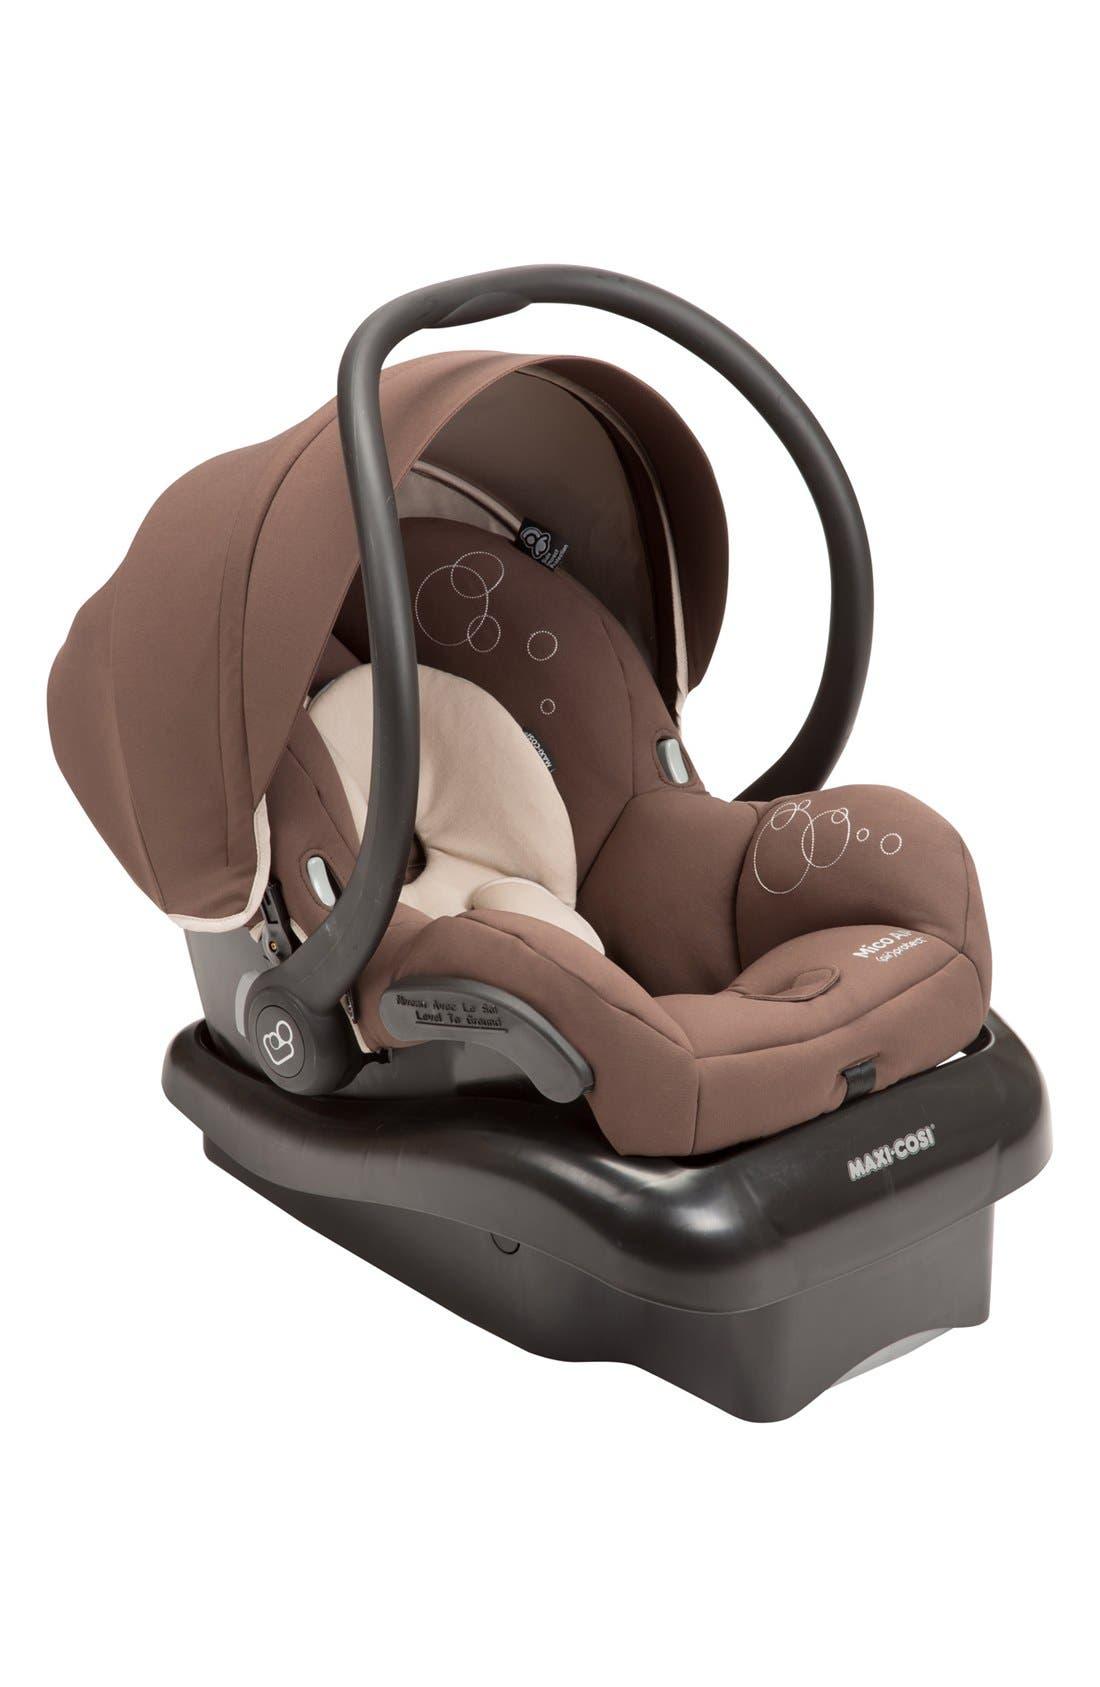 Mico AP Infant Car Seat & Base,                             Main thumbnail 1, color,                             MILK CHOCOLATE